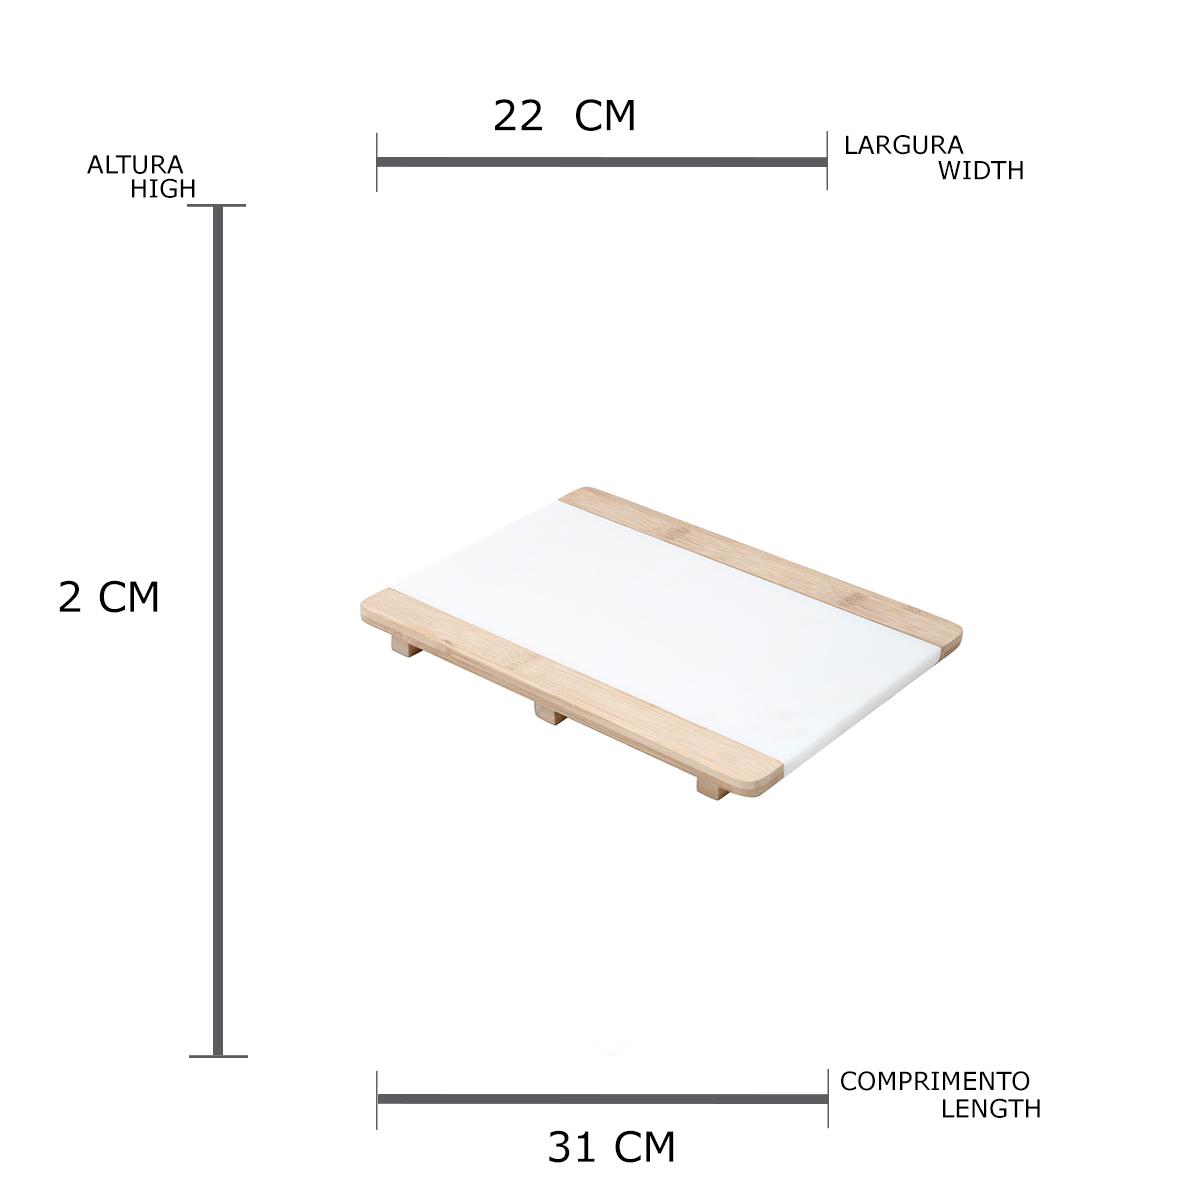 Bandeja natural de mármore branco com base de bambu